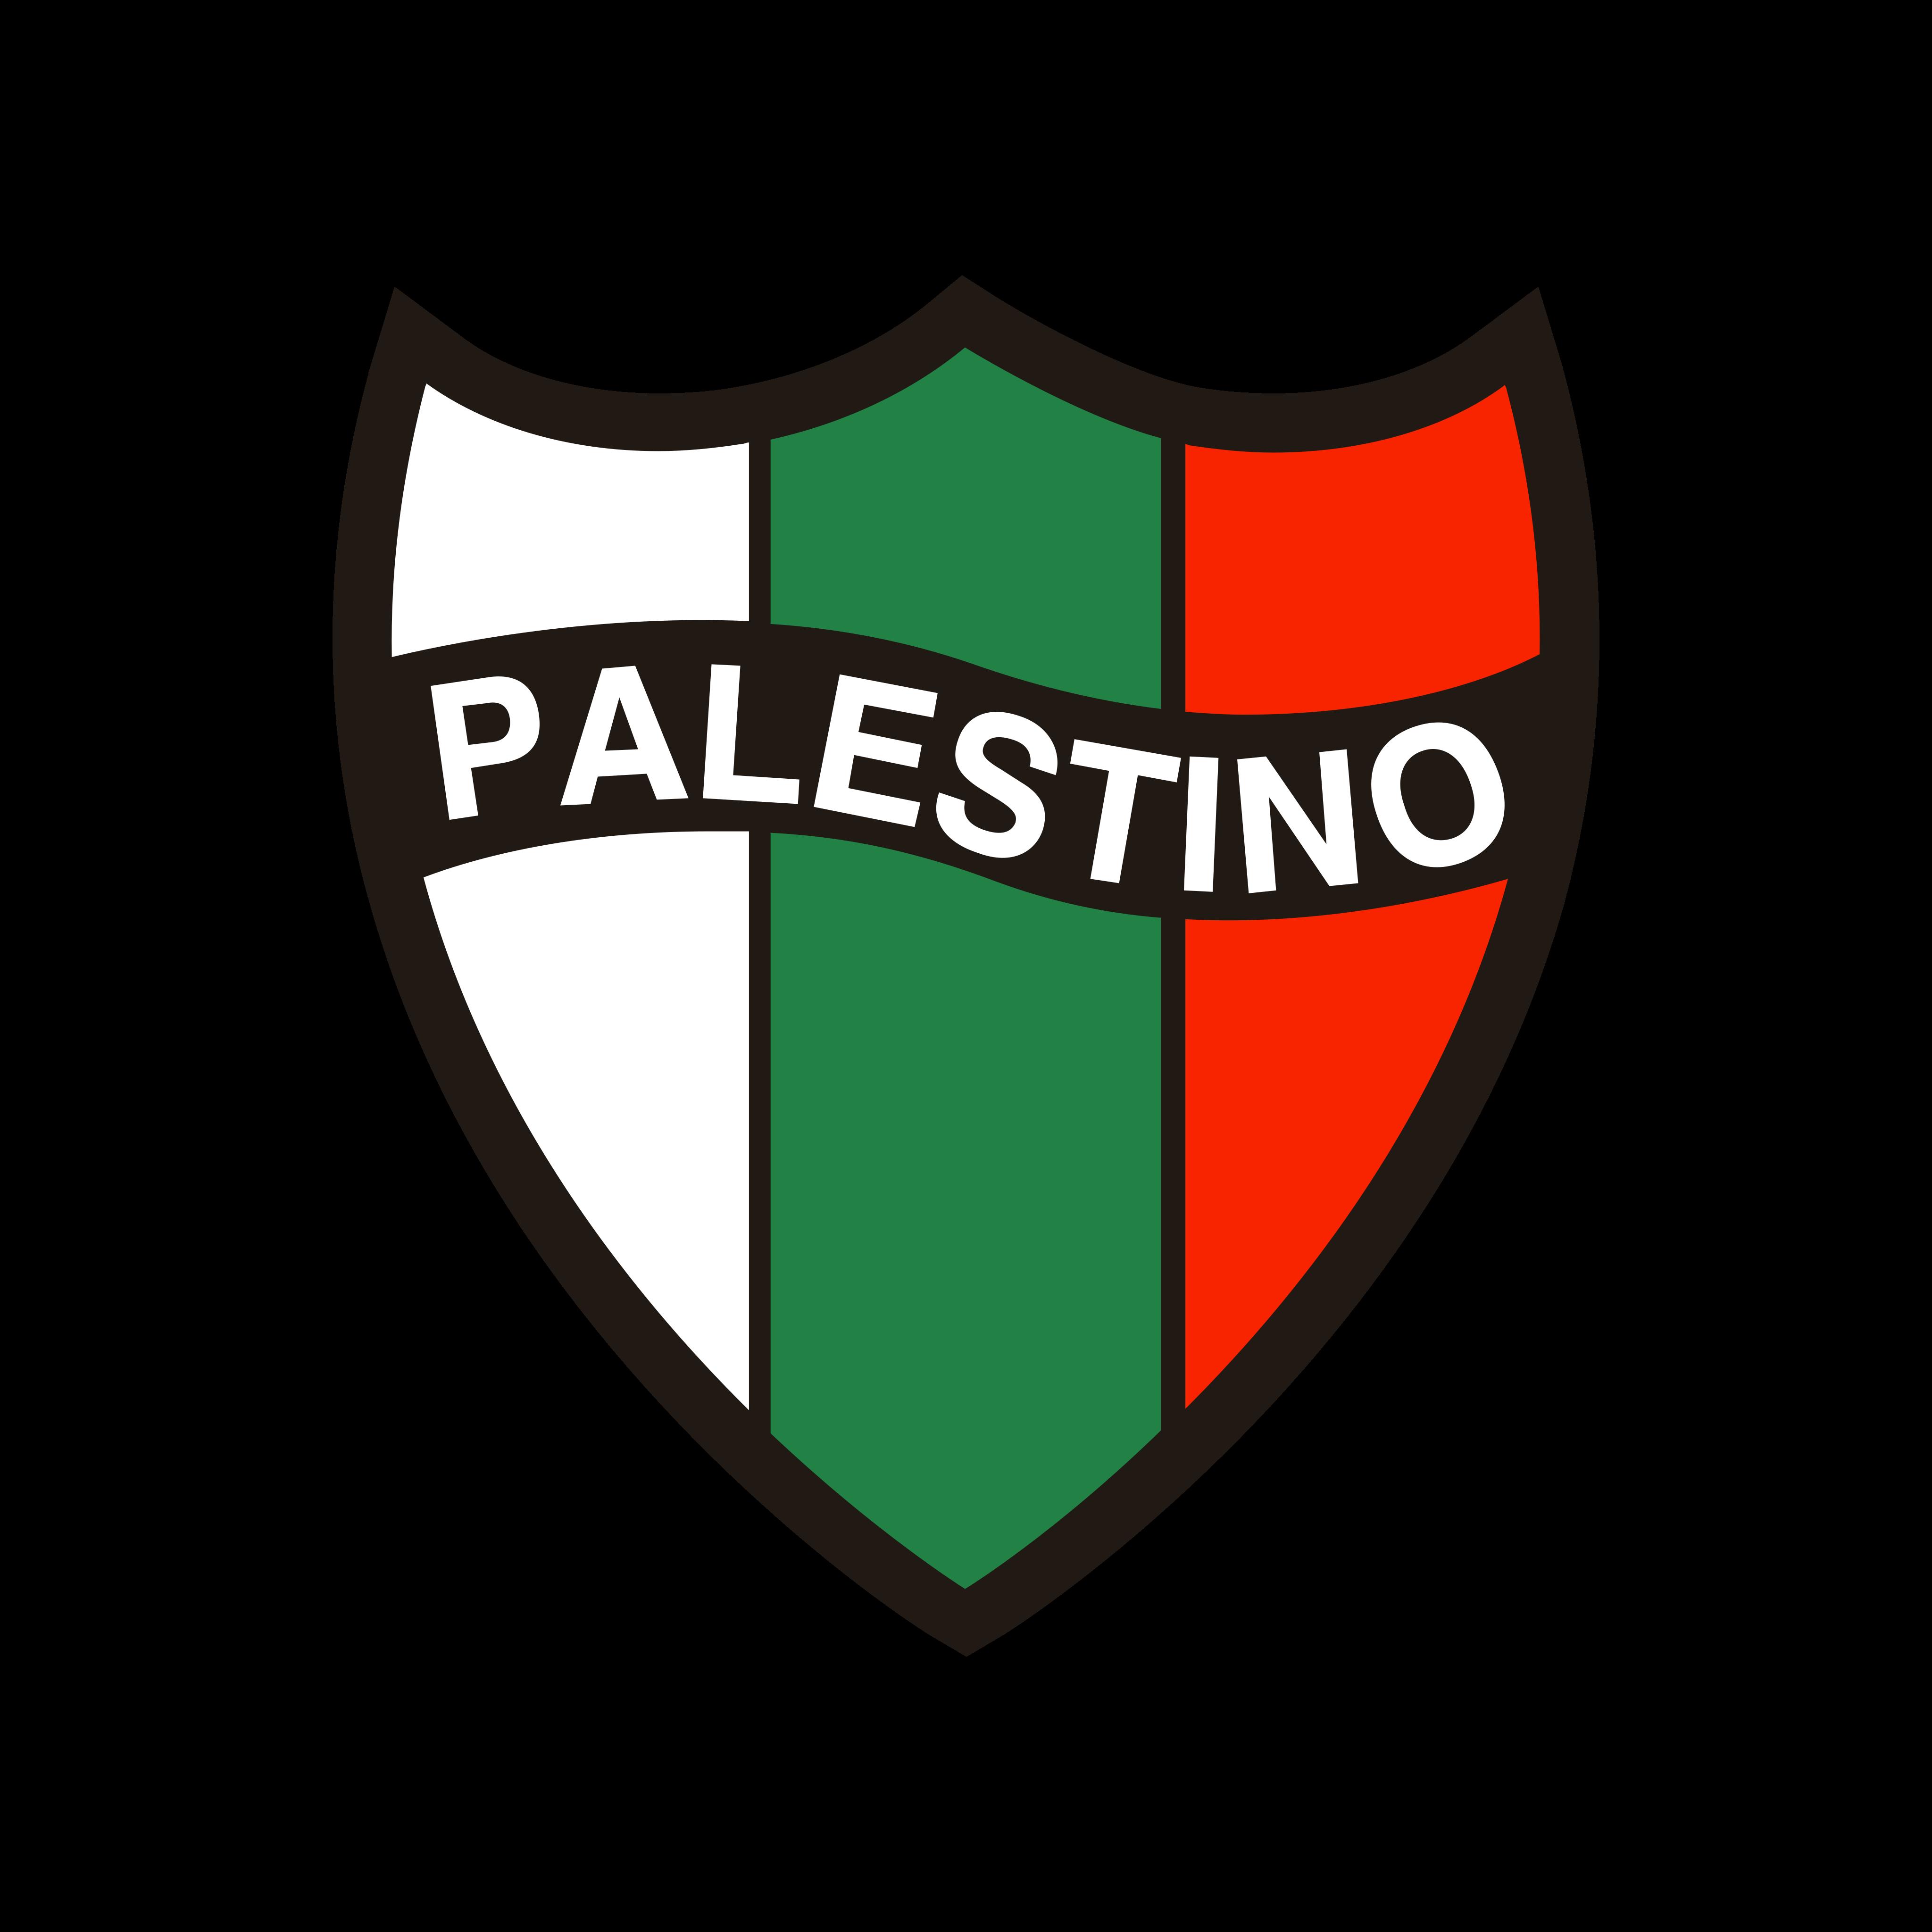 palestino logo 0 - Palestino Logo - Club Deportivo Palestino Escudo